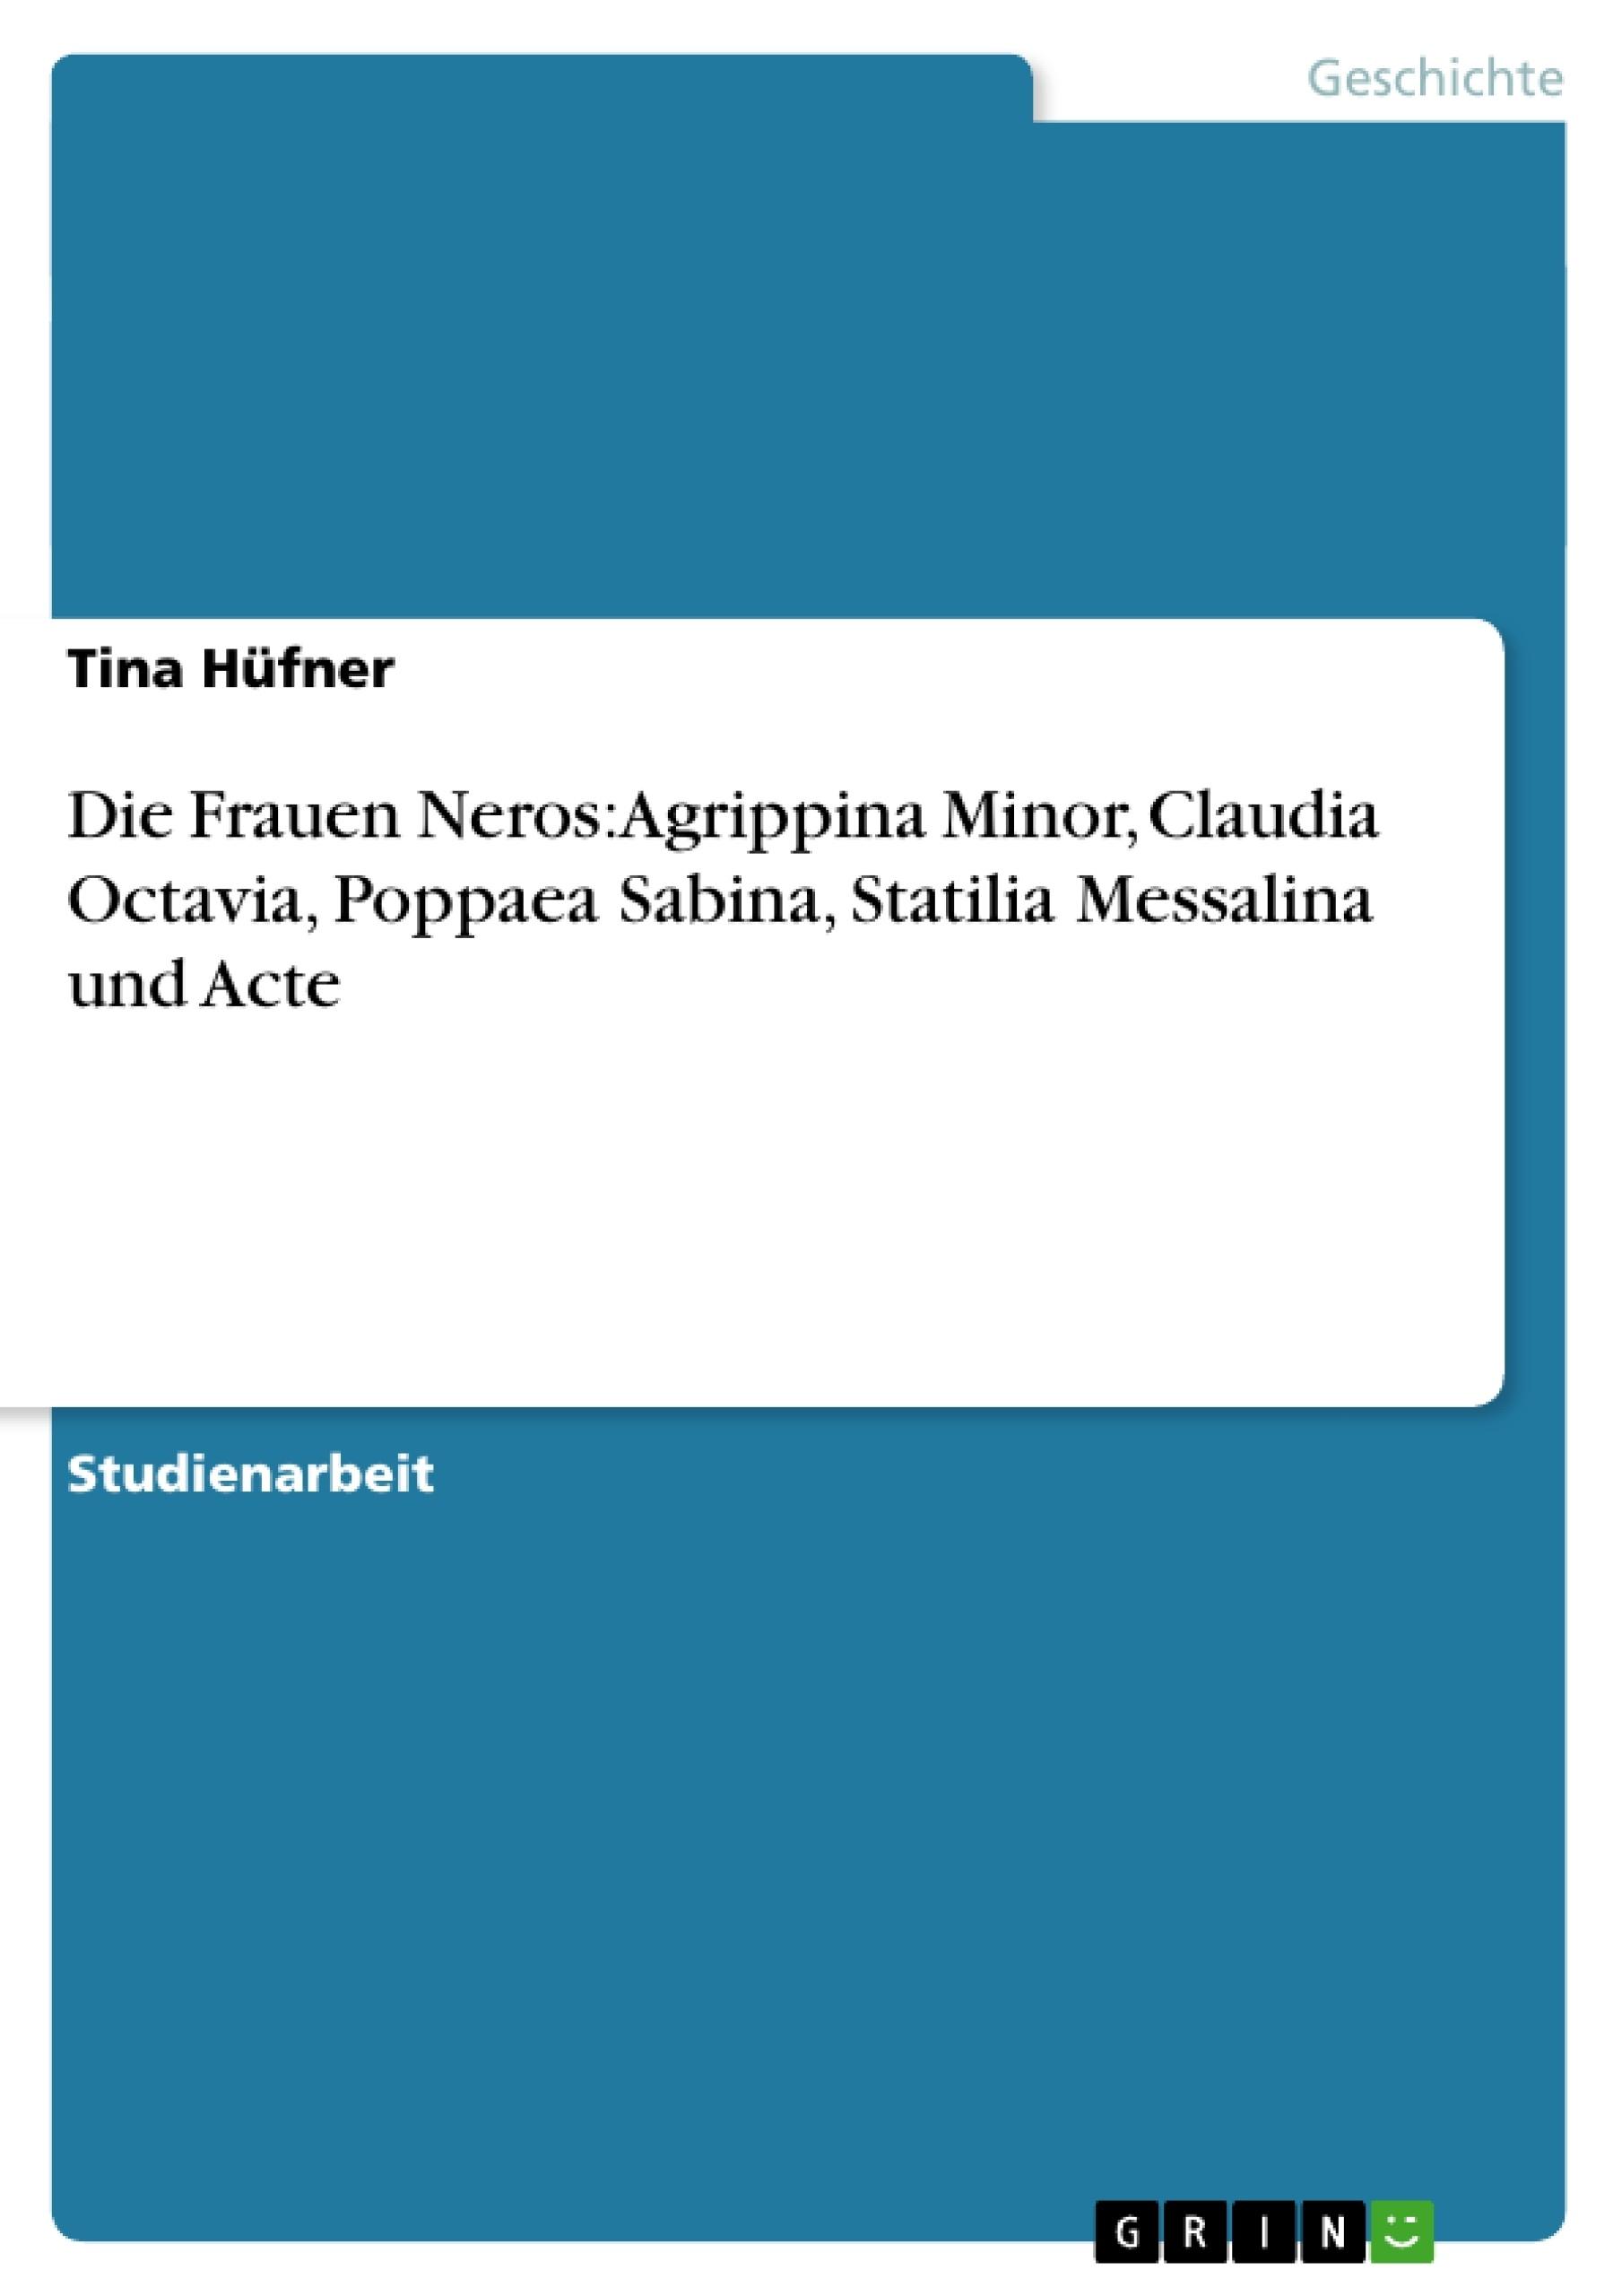 Titel: Die Frauen Neros: Agrippina Minor, Claudia Octavia, Poppaea Sabina, Statilia Messalina und Acte